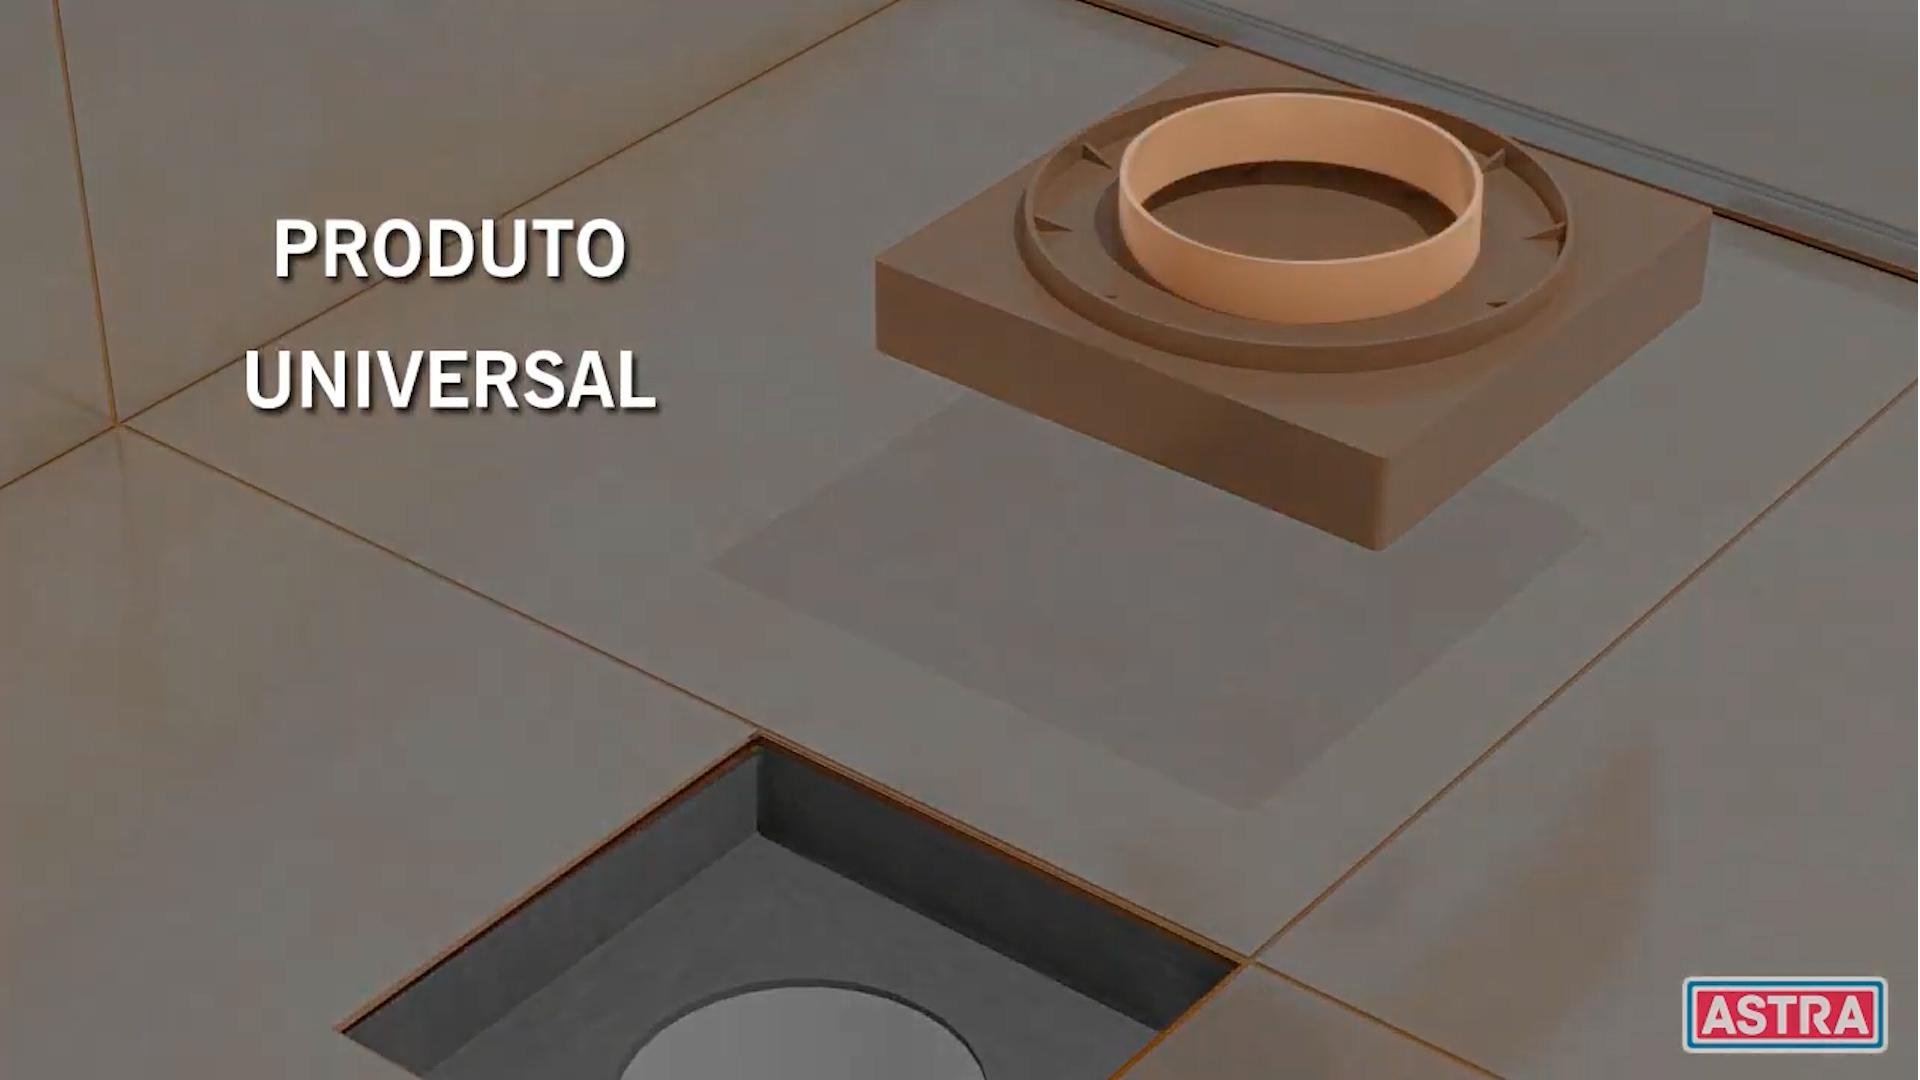 Ralo Oculto invisível 15x15 Universal Cinza Astra